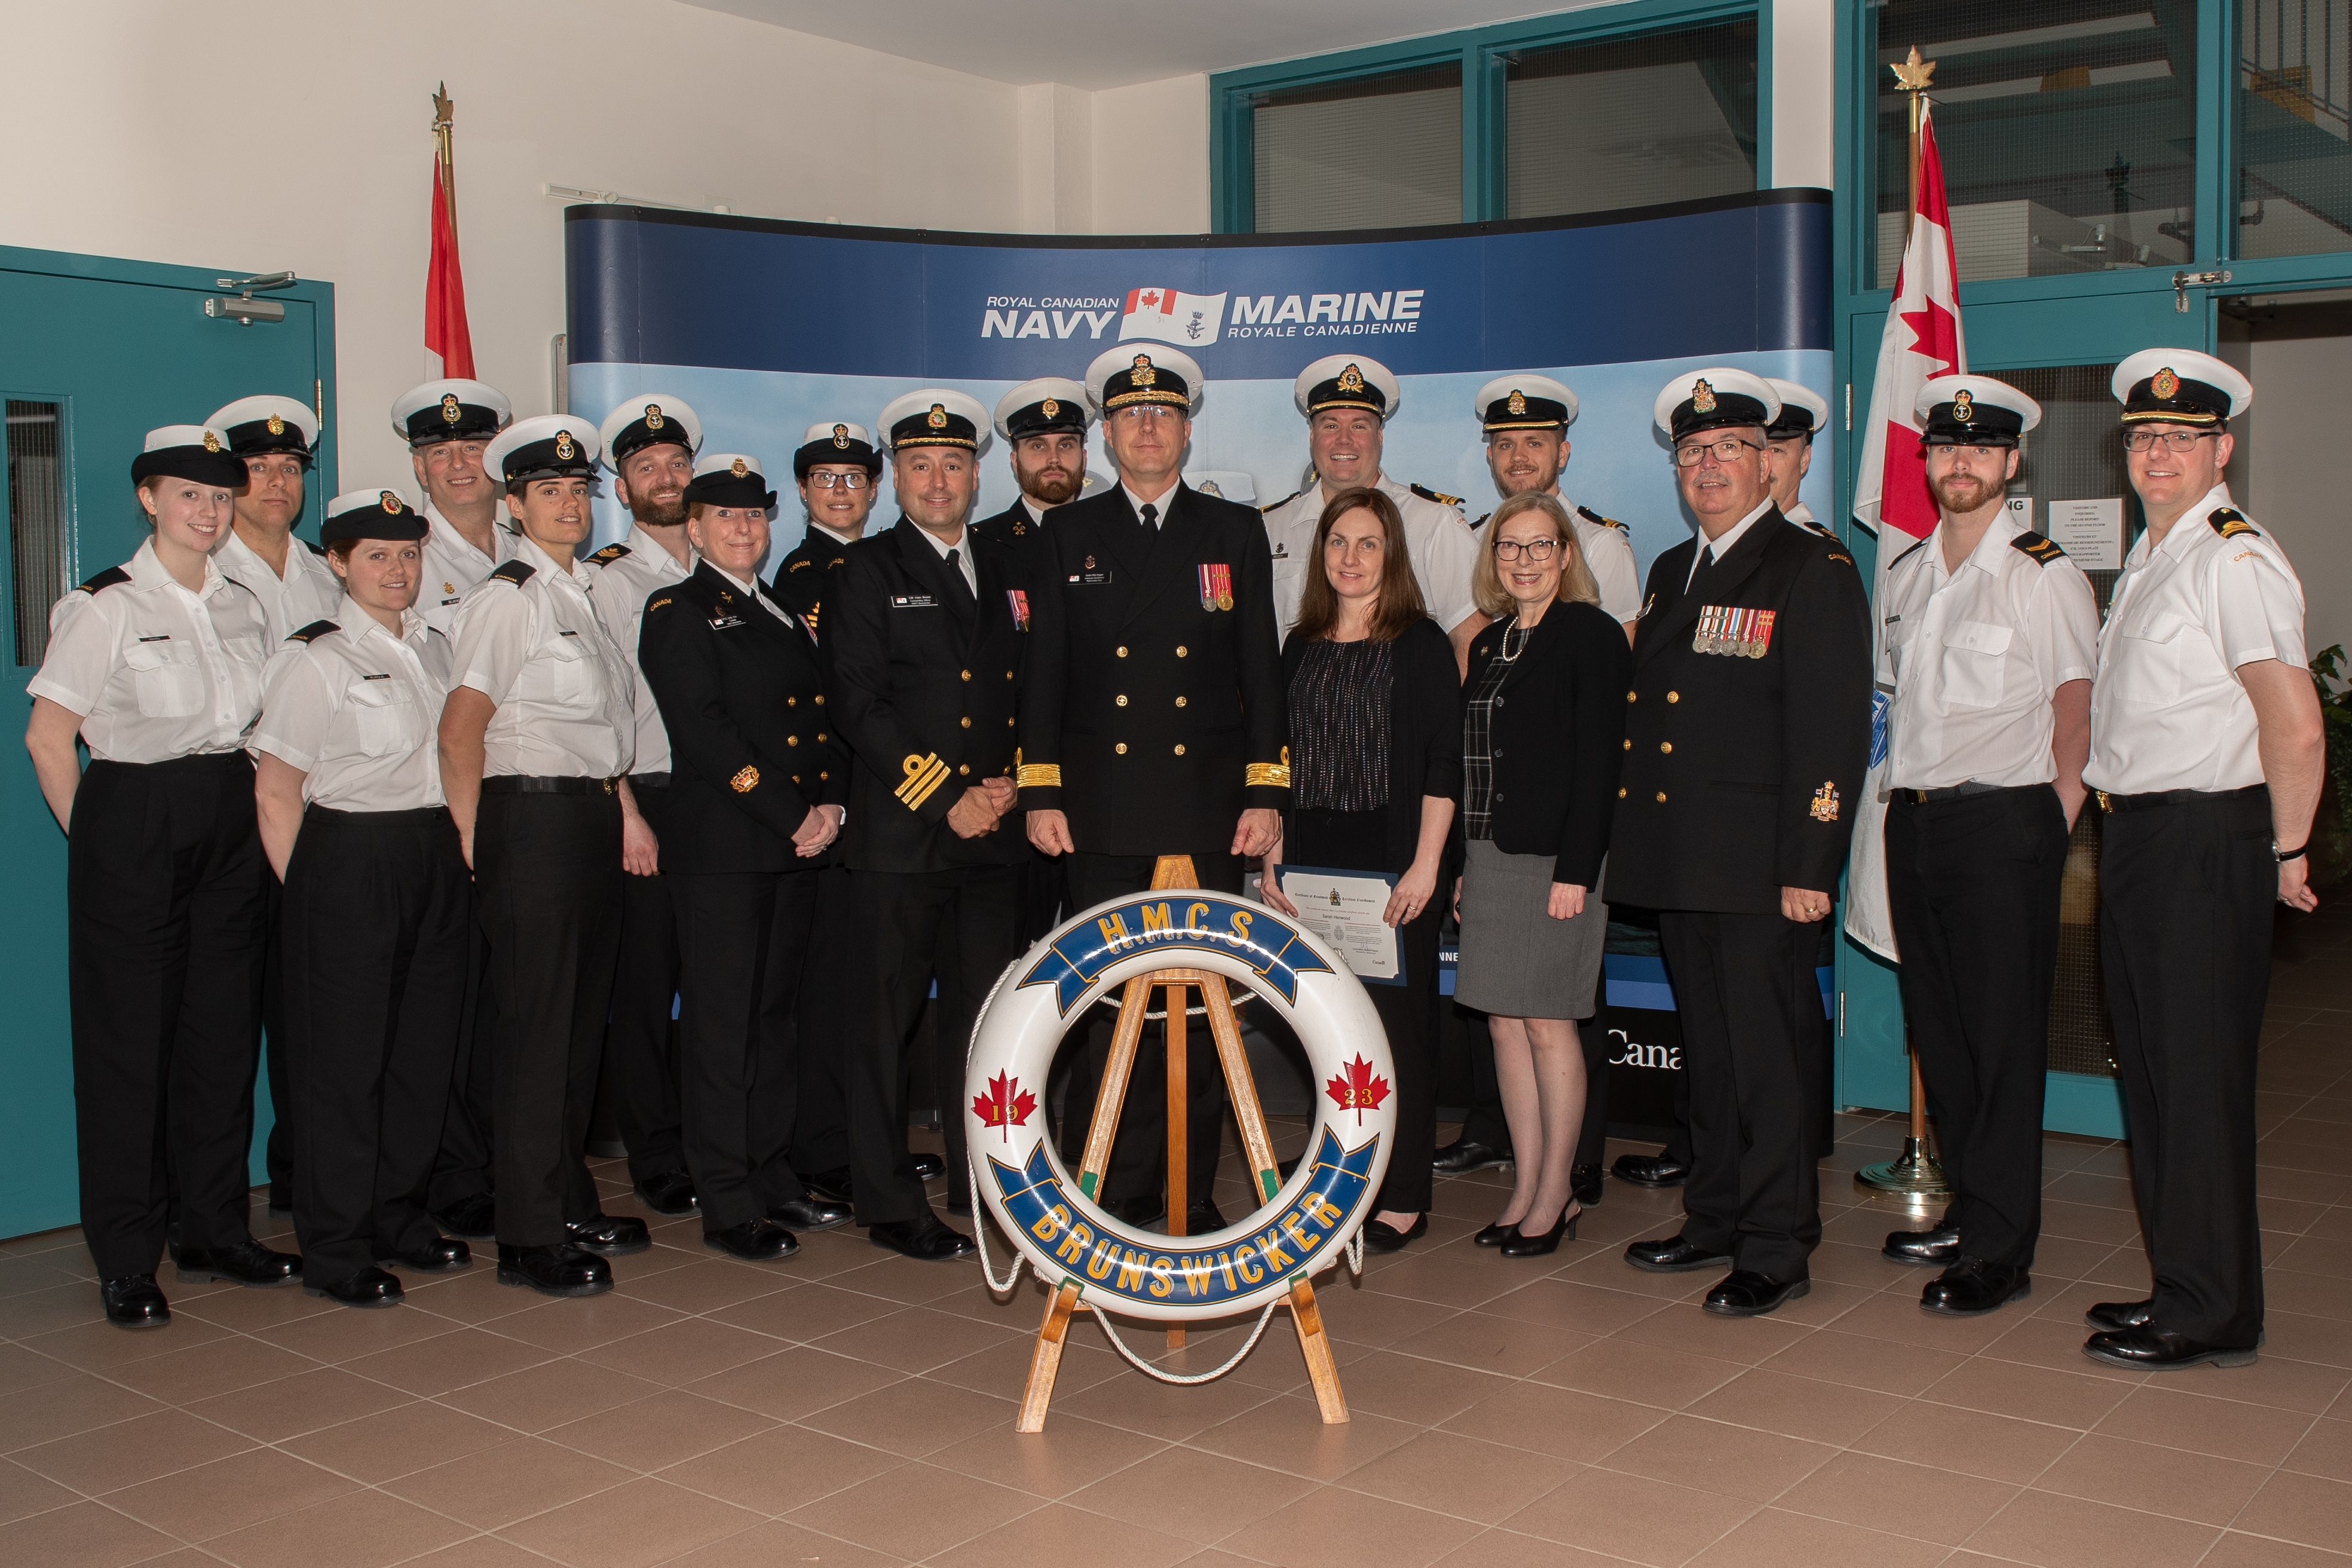 HMCS Brunswicker opens satellite in Moncton